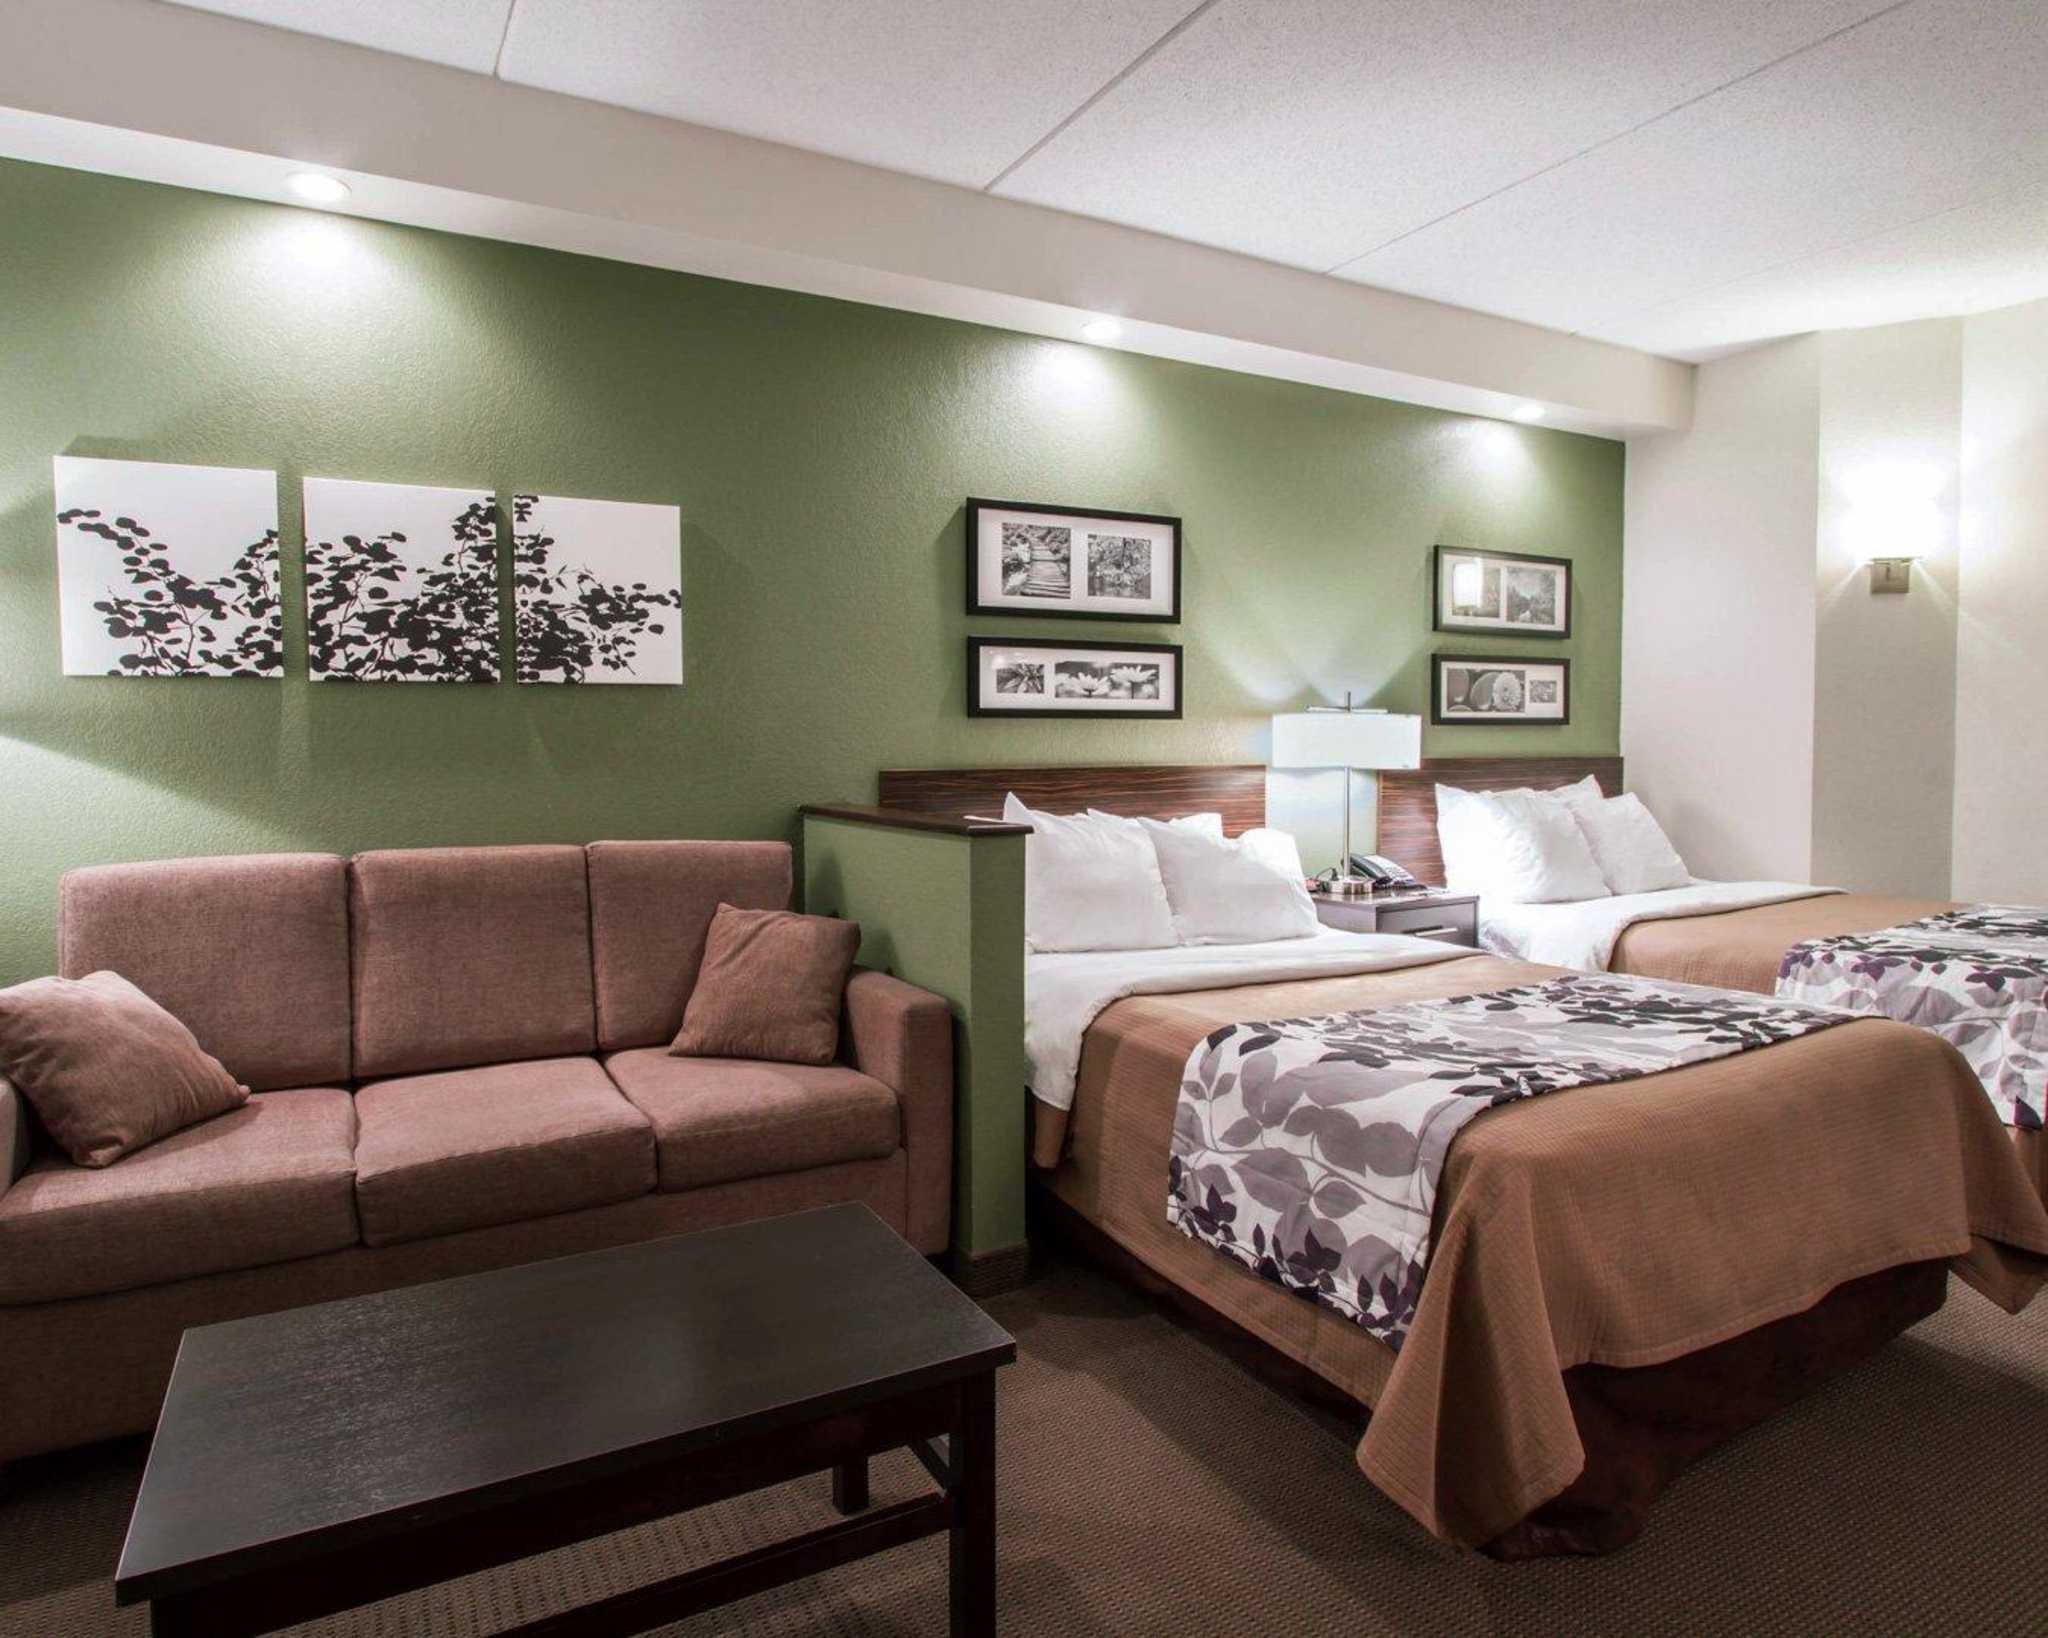 Sleep Inn & Suites Buffalo Airport image 23